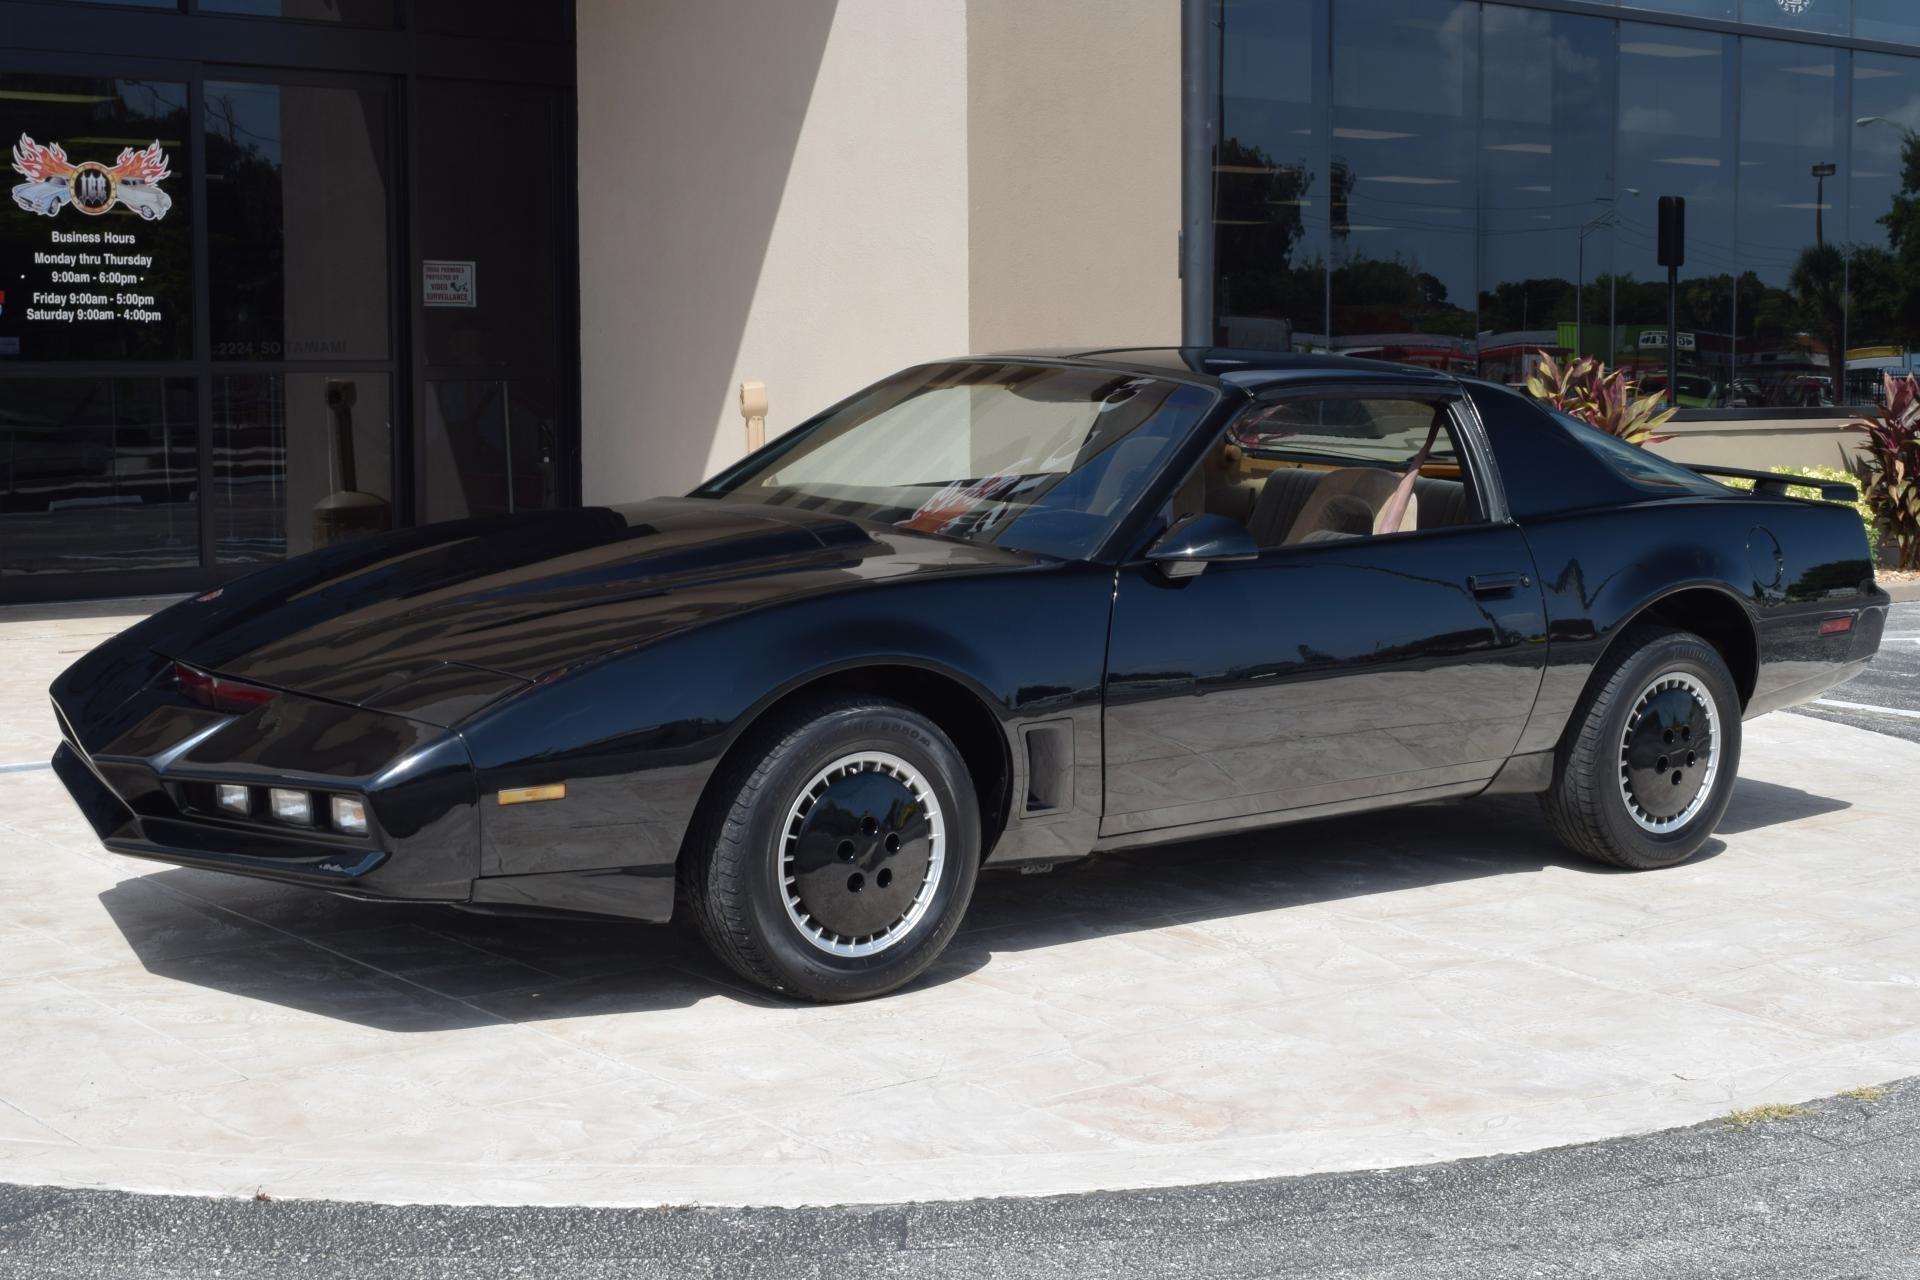 1982 Pontiac Firebird Kitt Finished In Black Paint With A Tan Interior Powered By A 305ci V8 Engine Mated To An Automatic Cars Movie Pontiac Firebird Pontiac